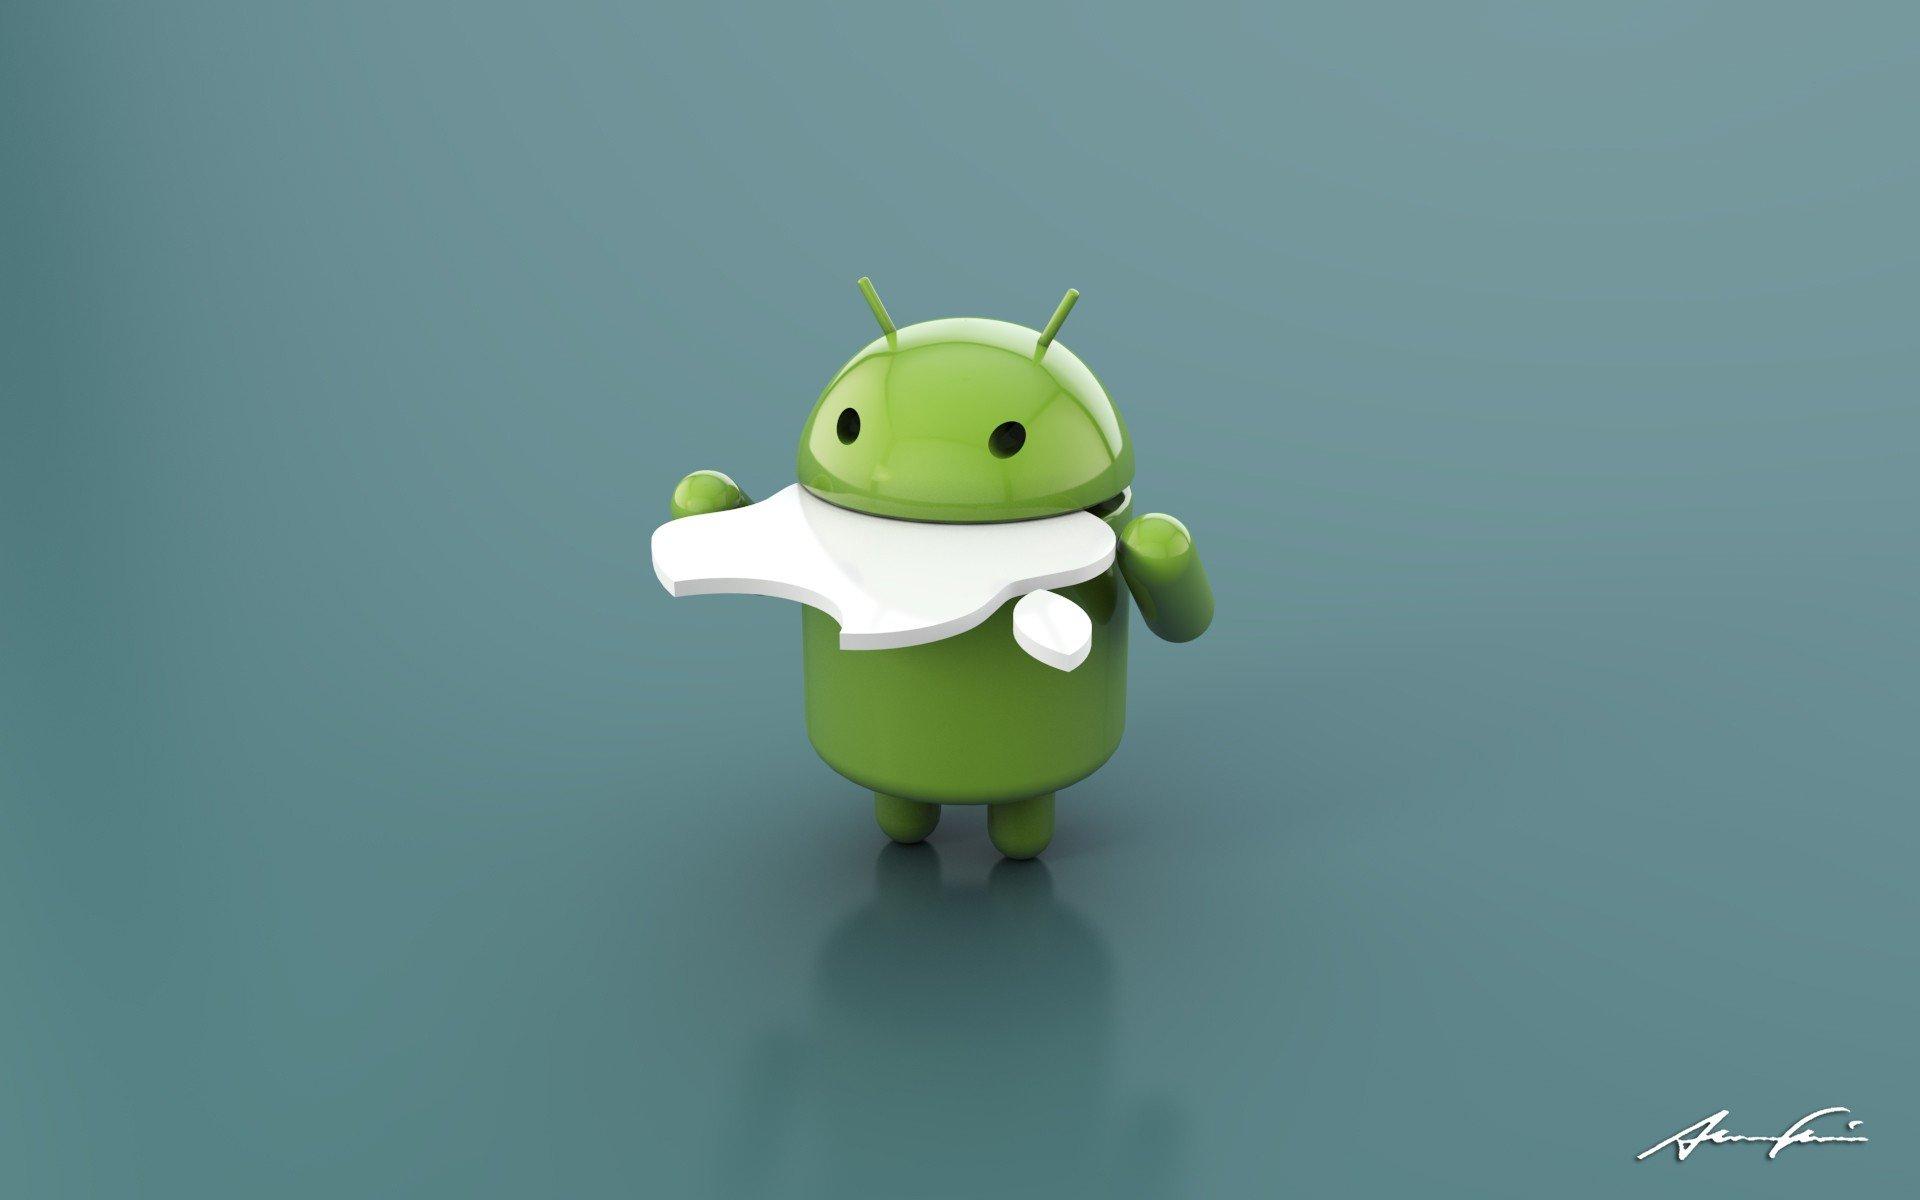 Wallpaper Px Android Apel Lucu Inc